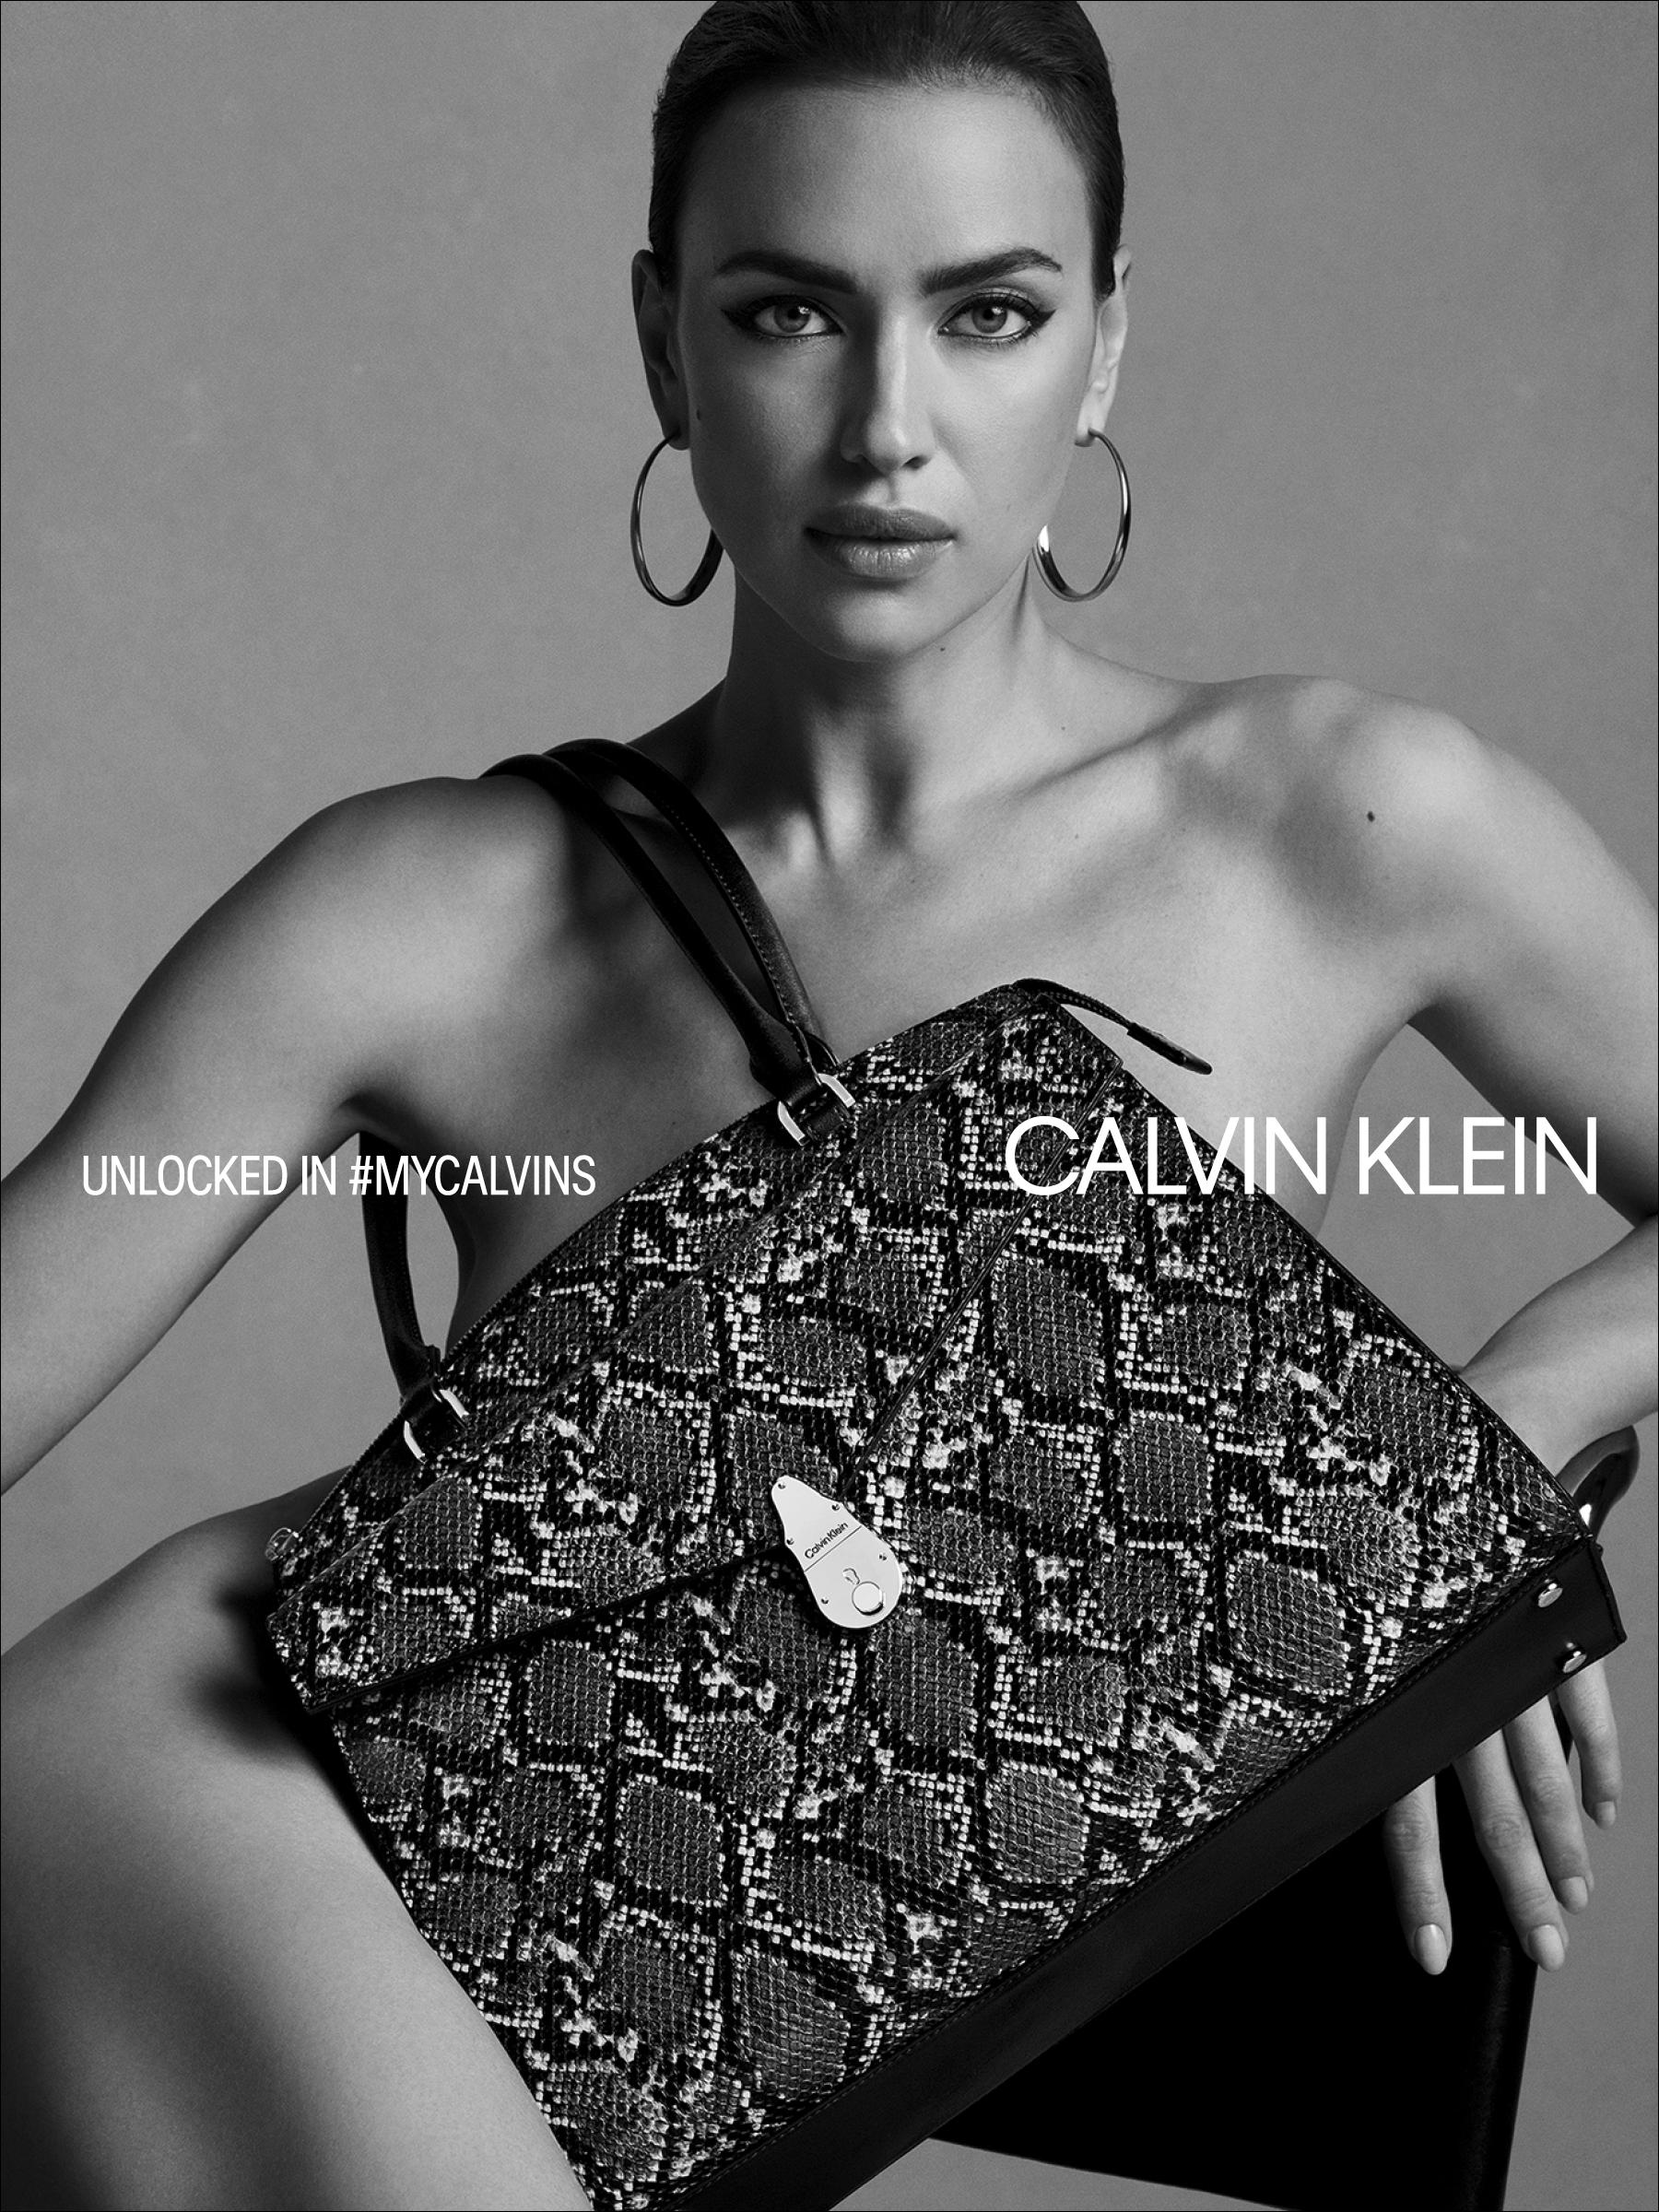 Calvin Klein Fall 2019 Handbag Ad Campaign by Inez and Vinoodh